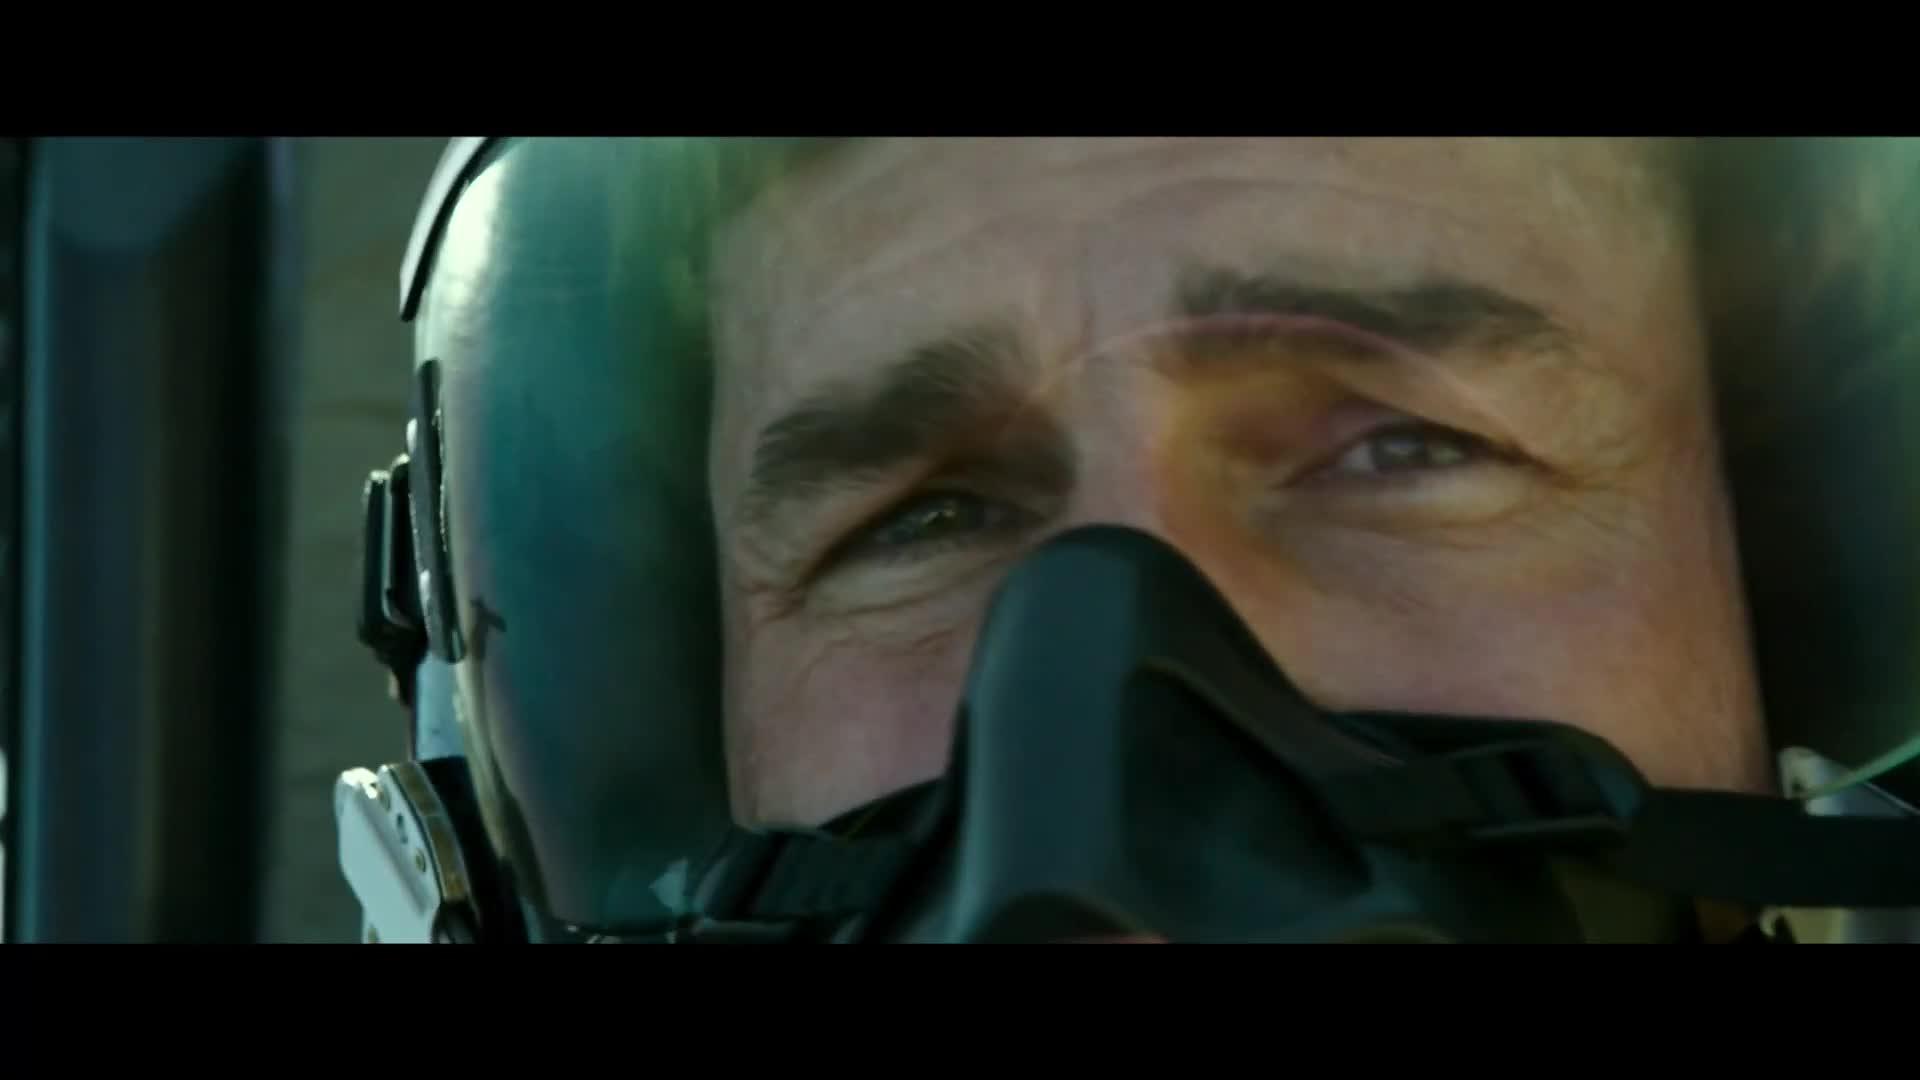 Trailer, Kino, Kinofilm, Paramount Pictures, Paramount, Tom Cruise, Top Gun, Top Gun Maverick, Maverick, Actionfilm